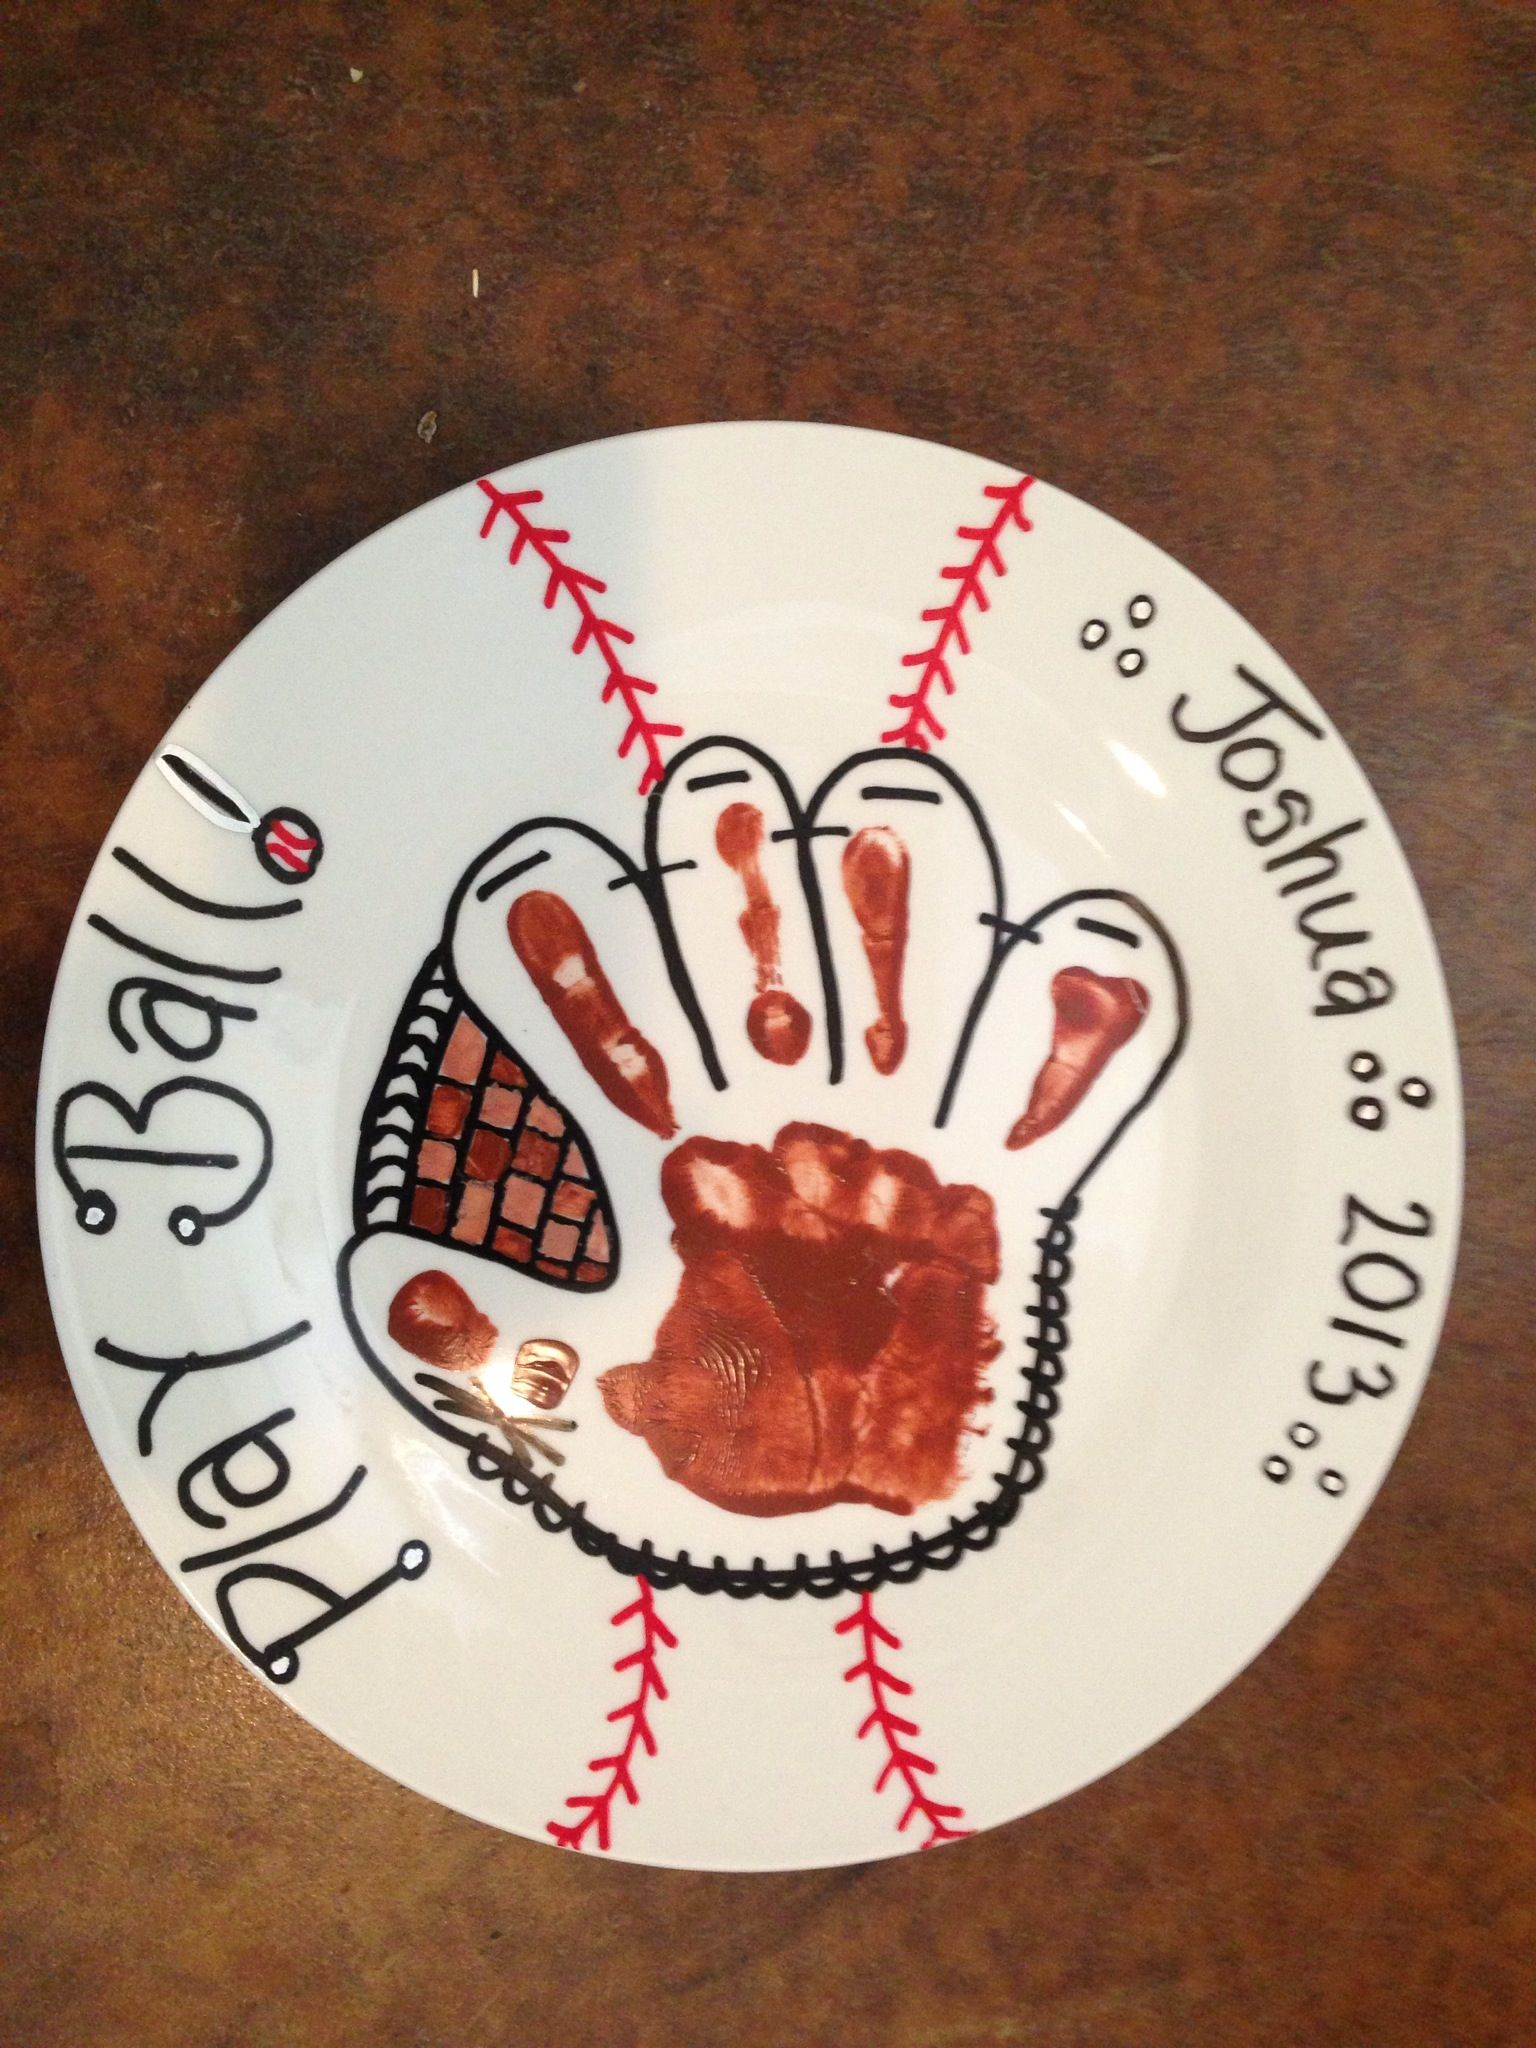 Baseball glove handprint handprint crafts crafts